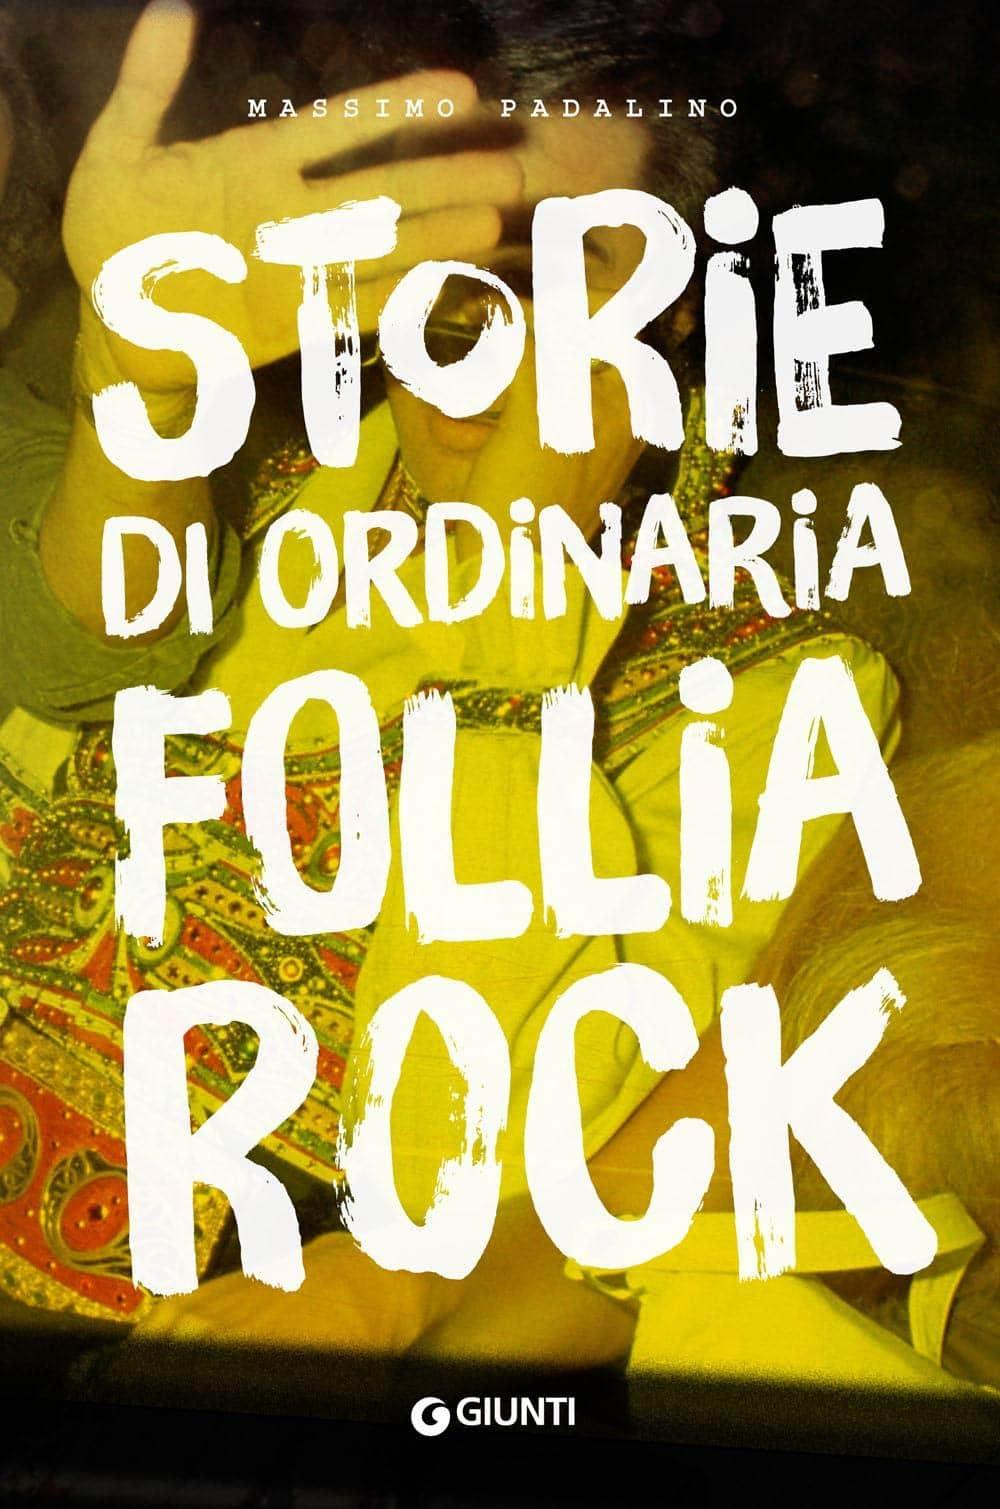 Recensione di Storie Di Ordinaria Follia Rock – M. Padalino